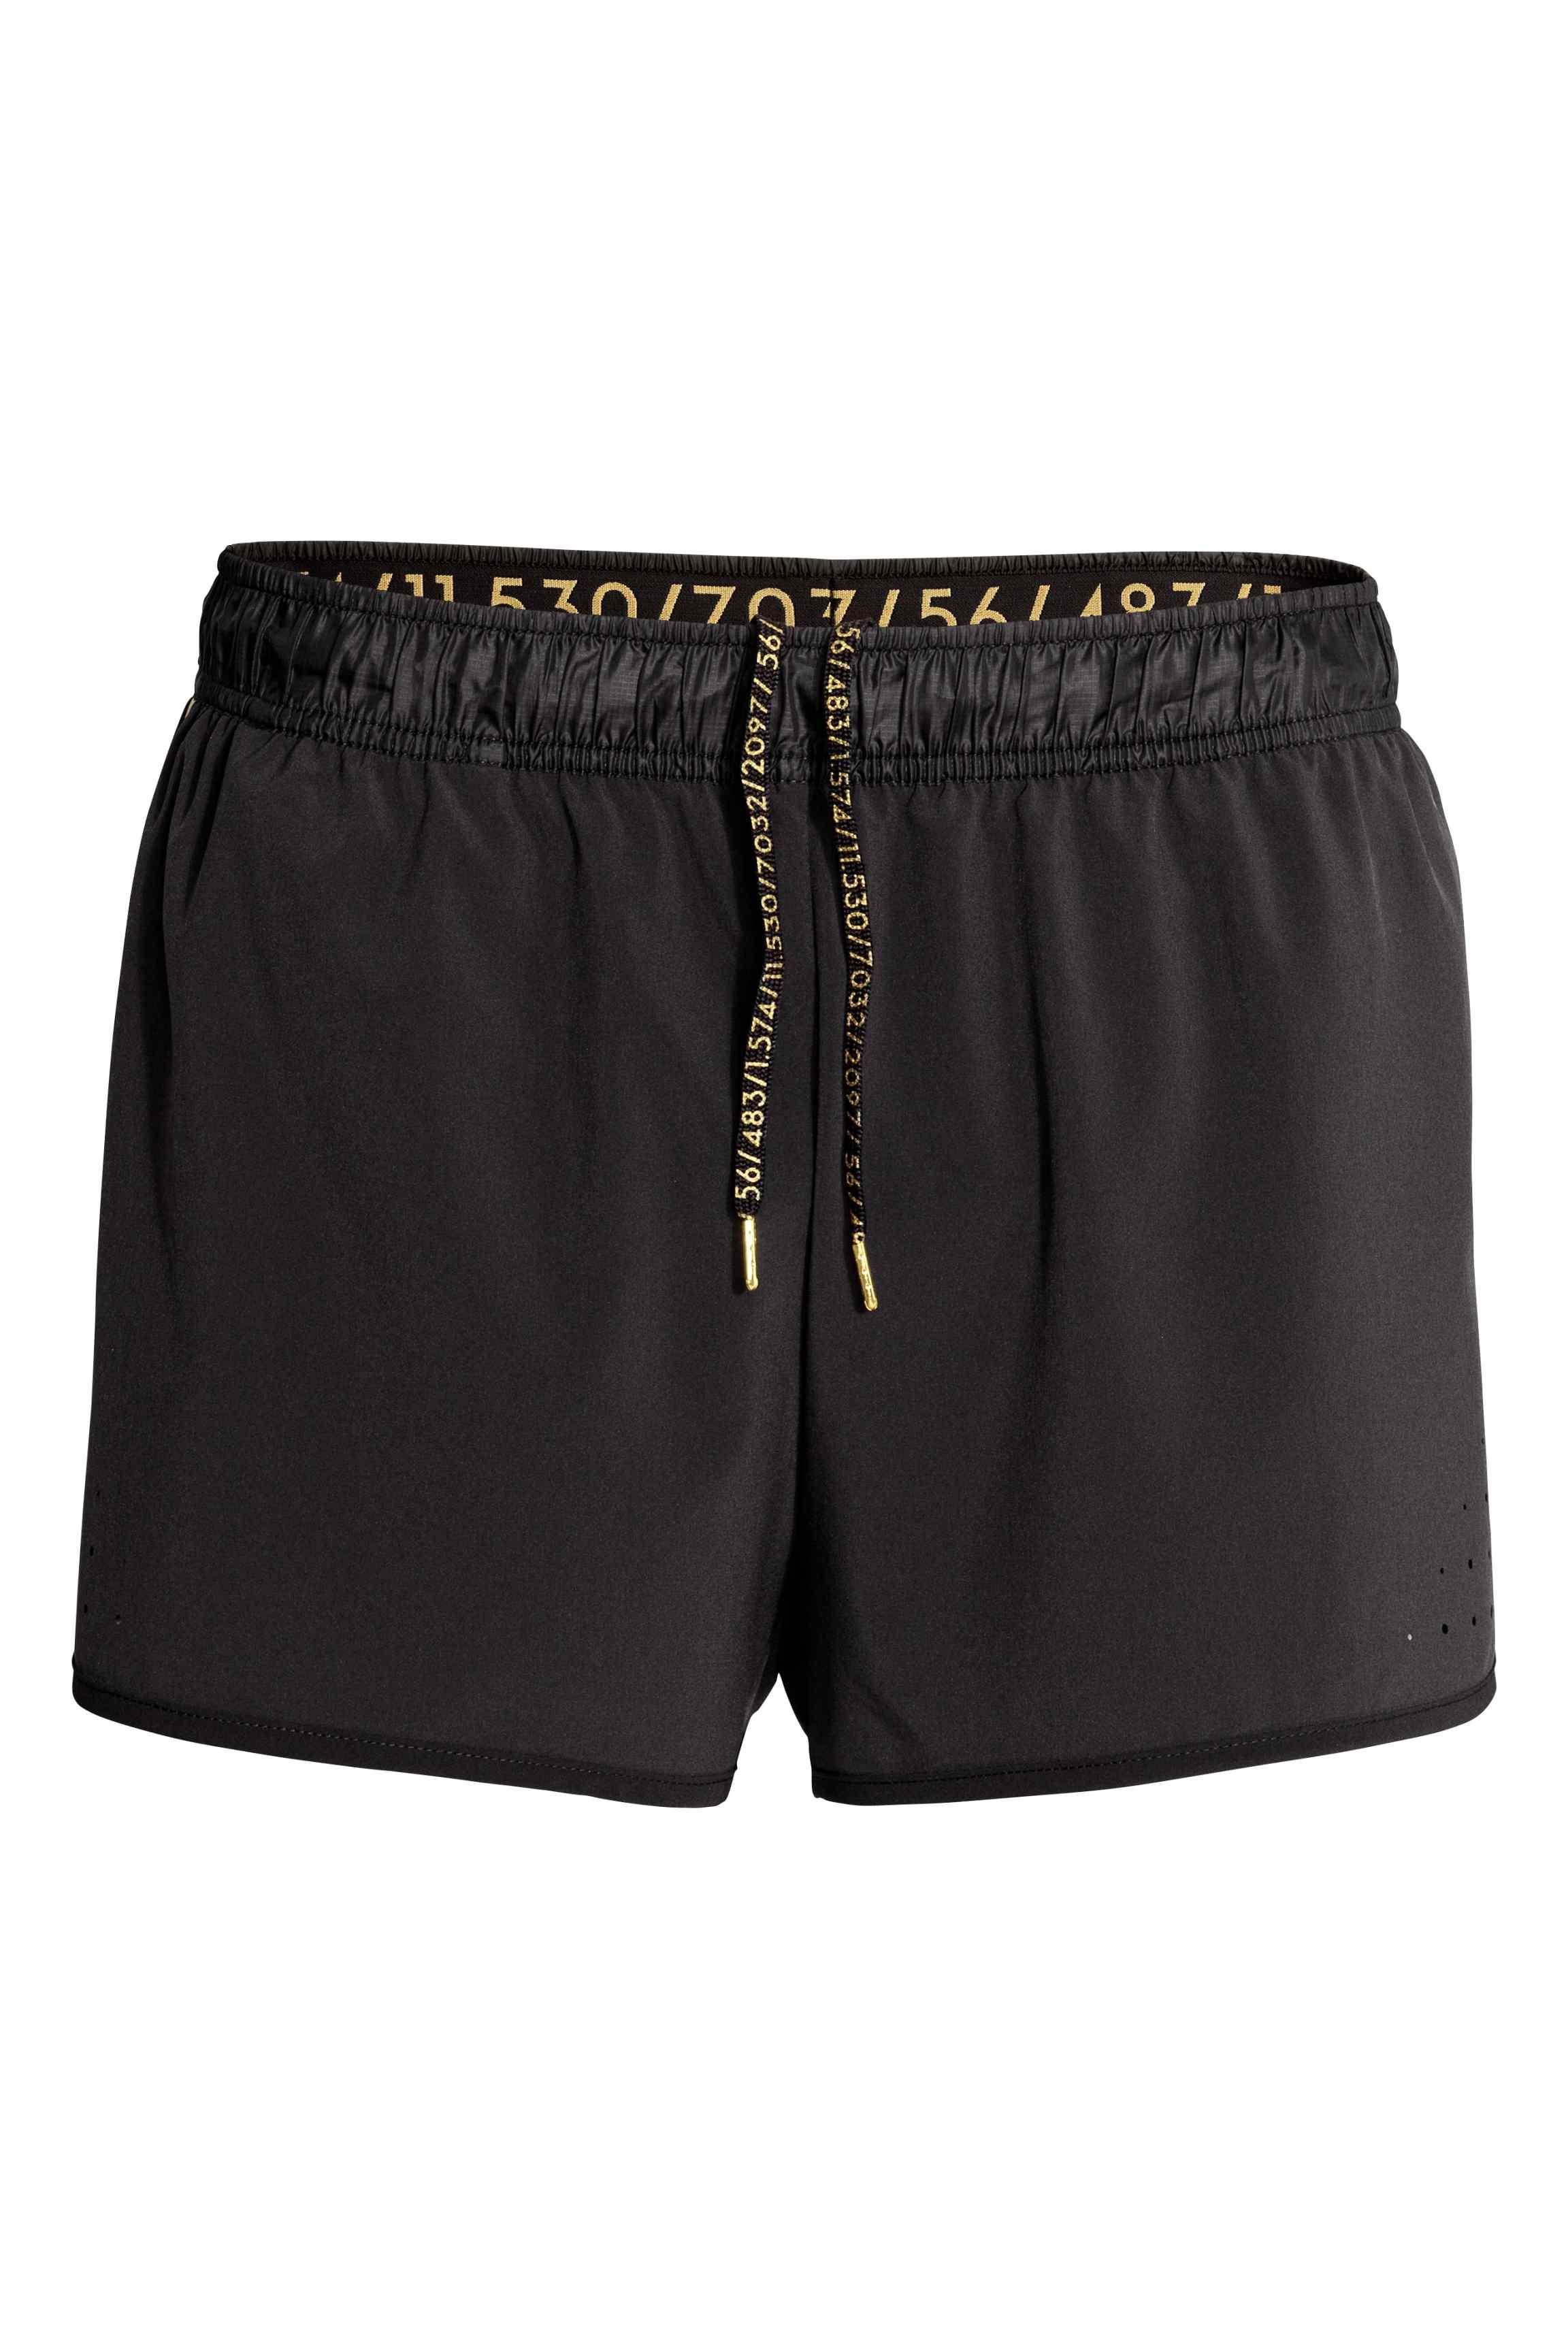 Running shorts, £19.99 ( hm.com )